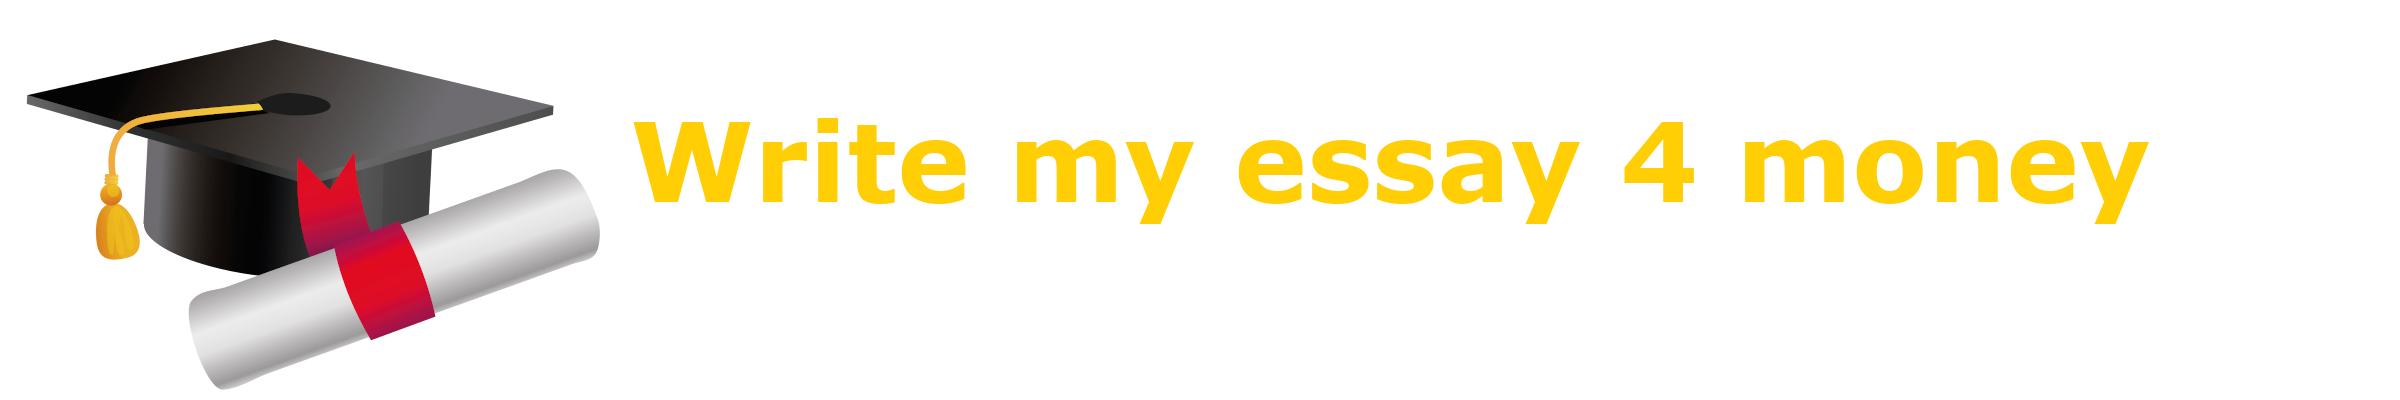 writemyessay4money.com